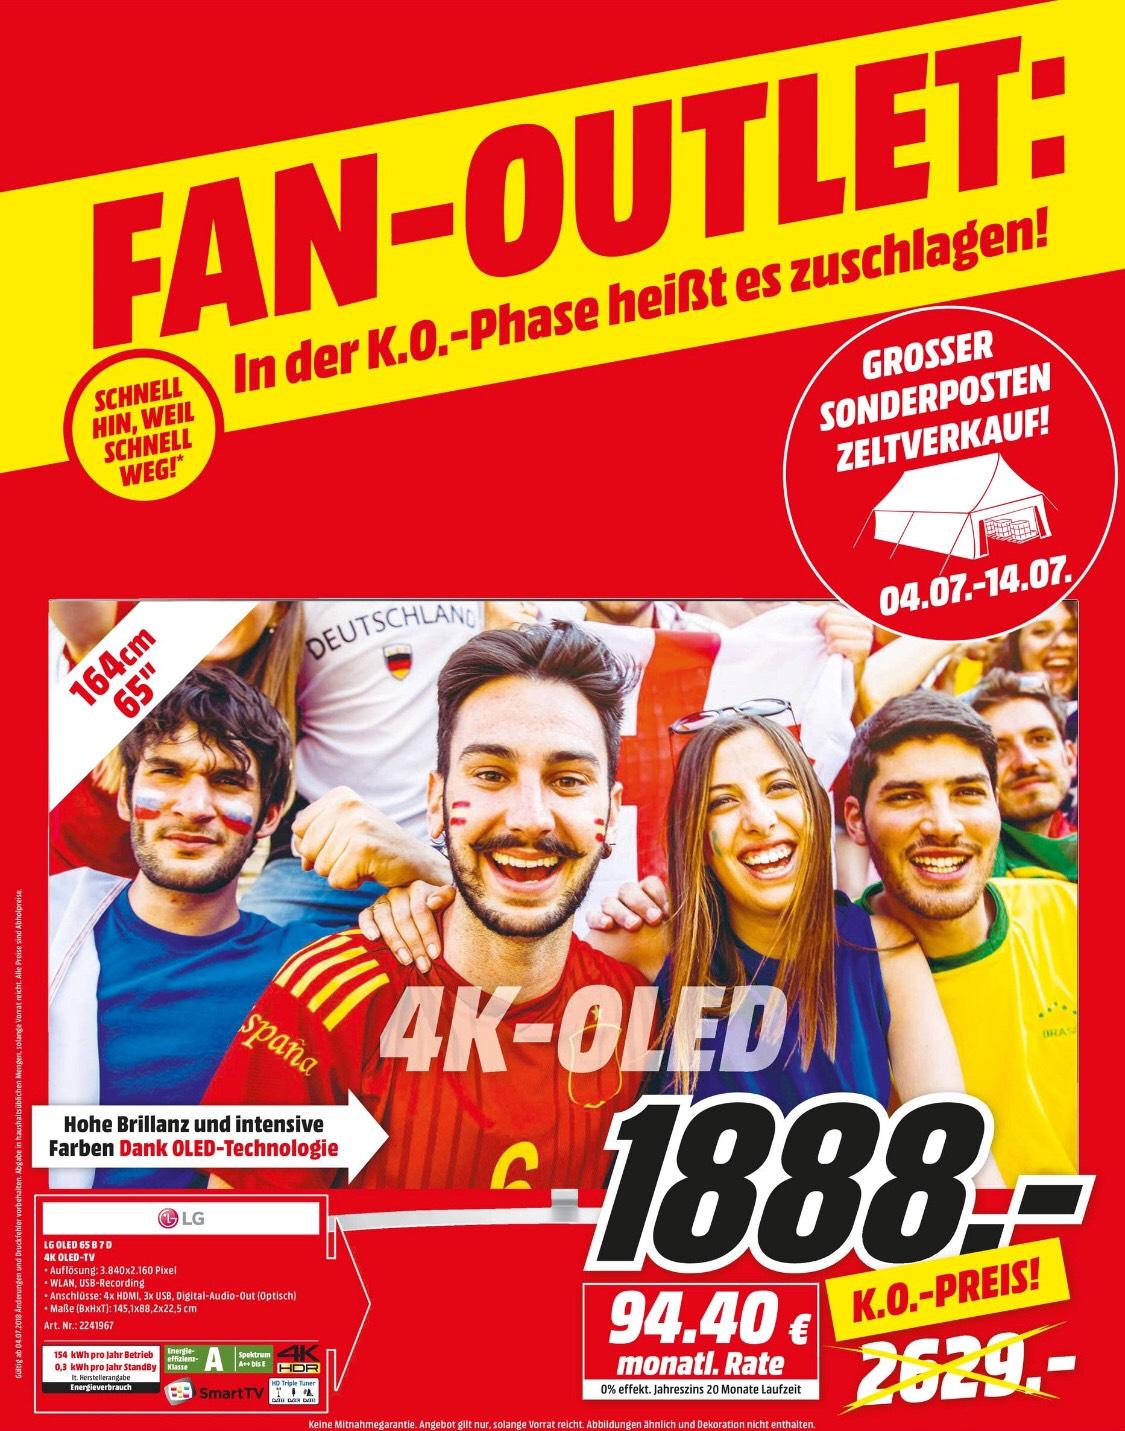 LG OLED65B7D OLED TV 65 Zoll 4K SMART TV für 1.888,-€ [Lokal, Media Markt Gütersloh]